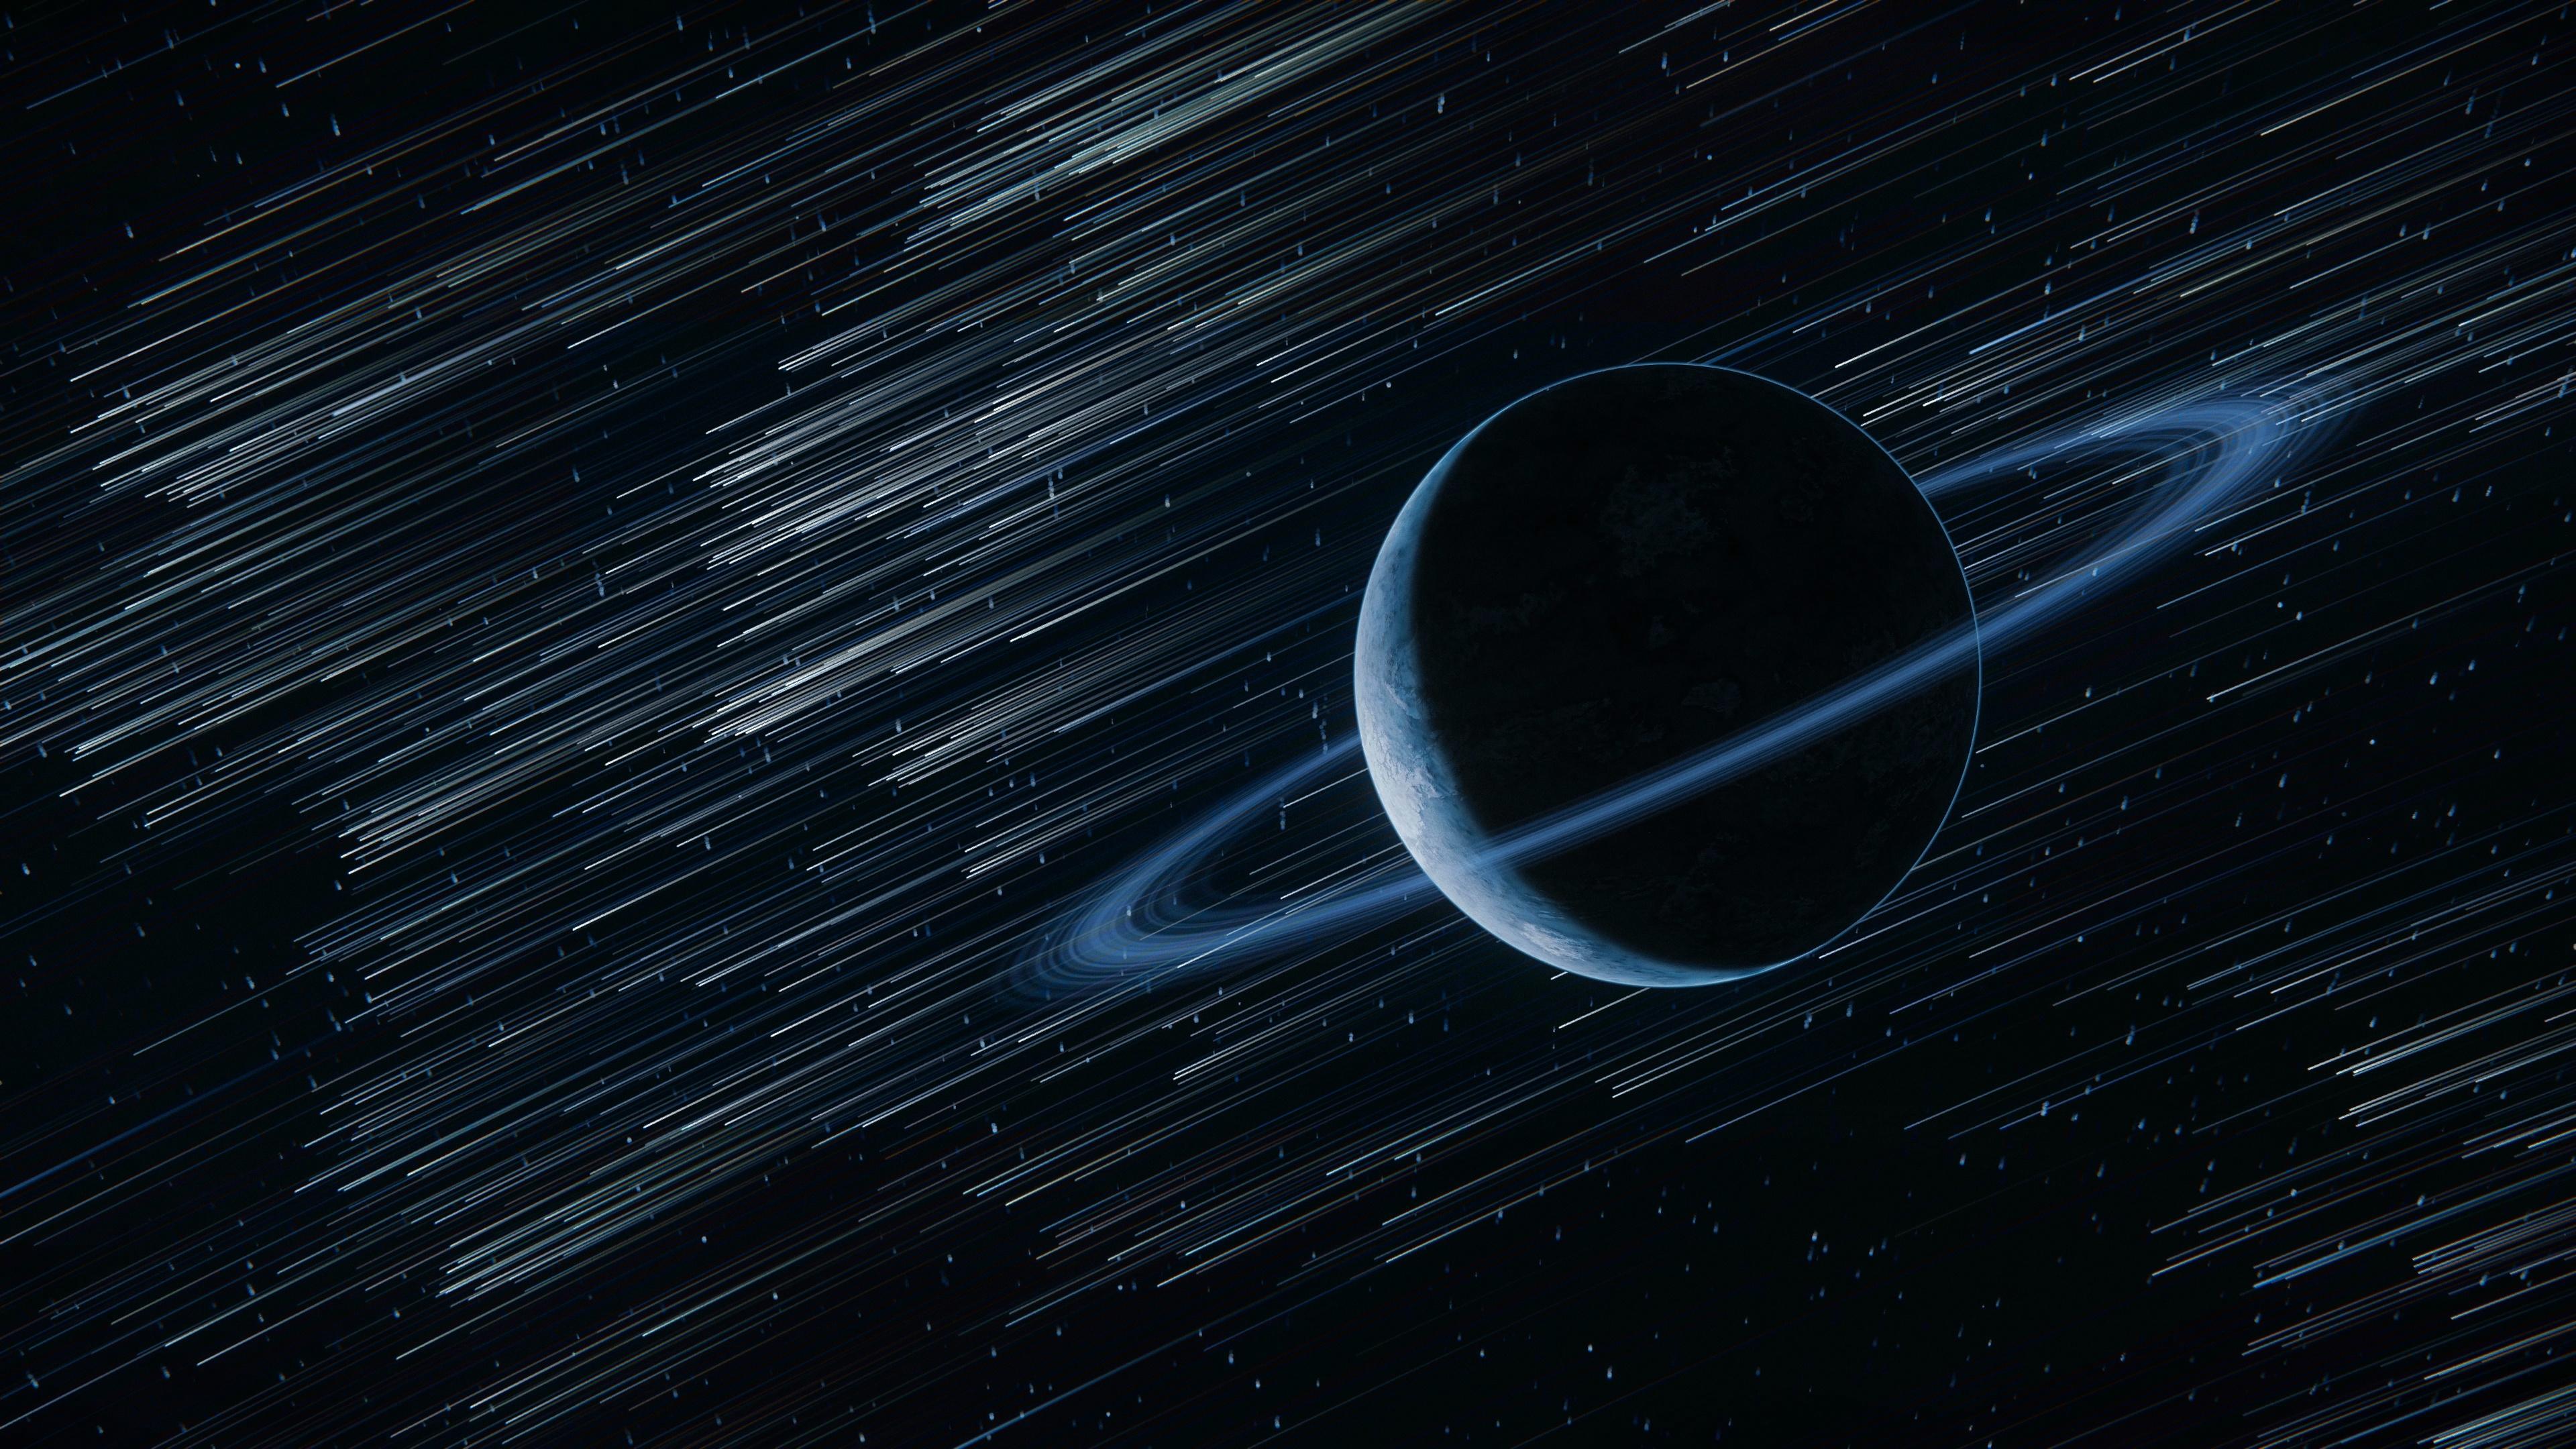 Saturn Planet Wallpaper Hd Artist 4k Wallpapers Images